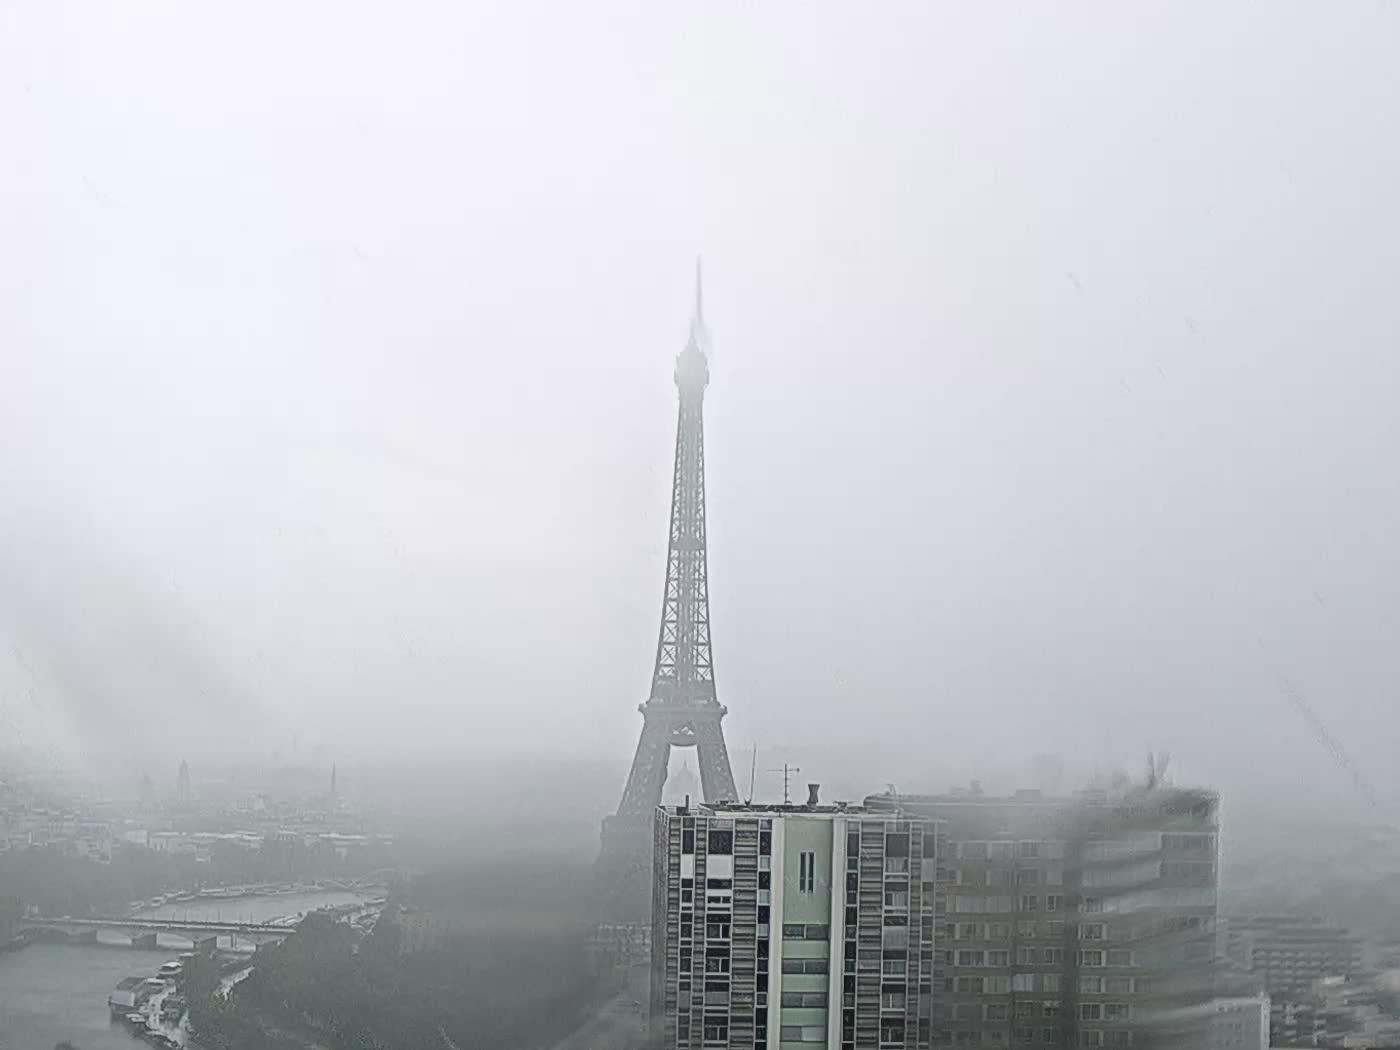 Paris Thu. 15:22